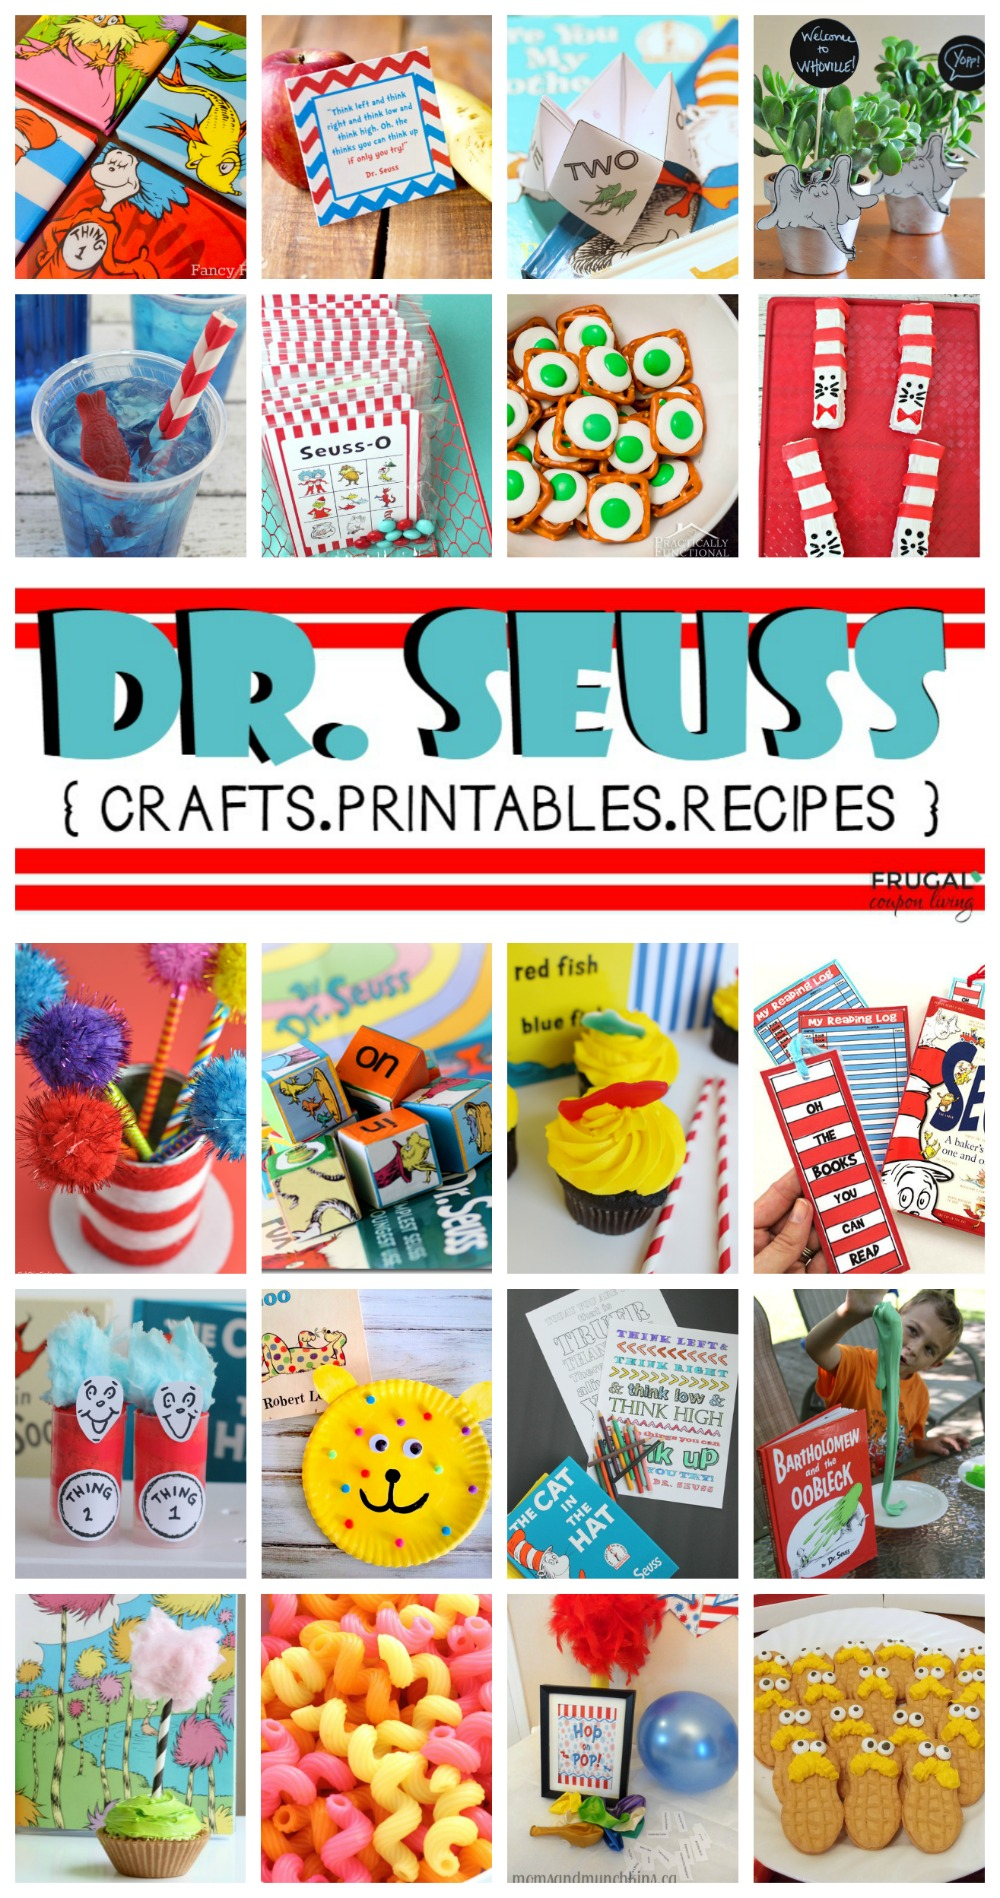 Dr-seuss-crafts-printables-recipes-frugal-coupon-living